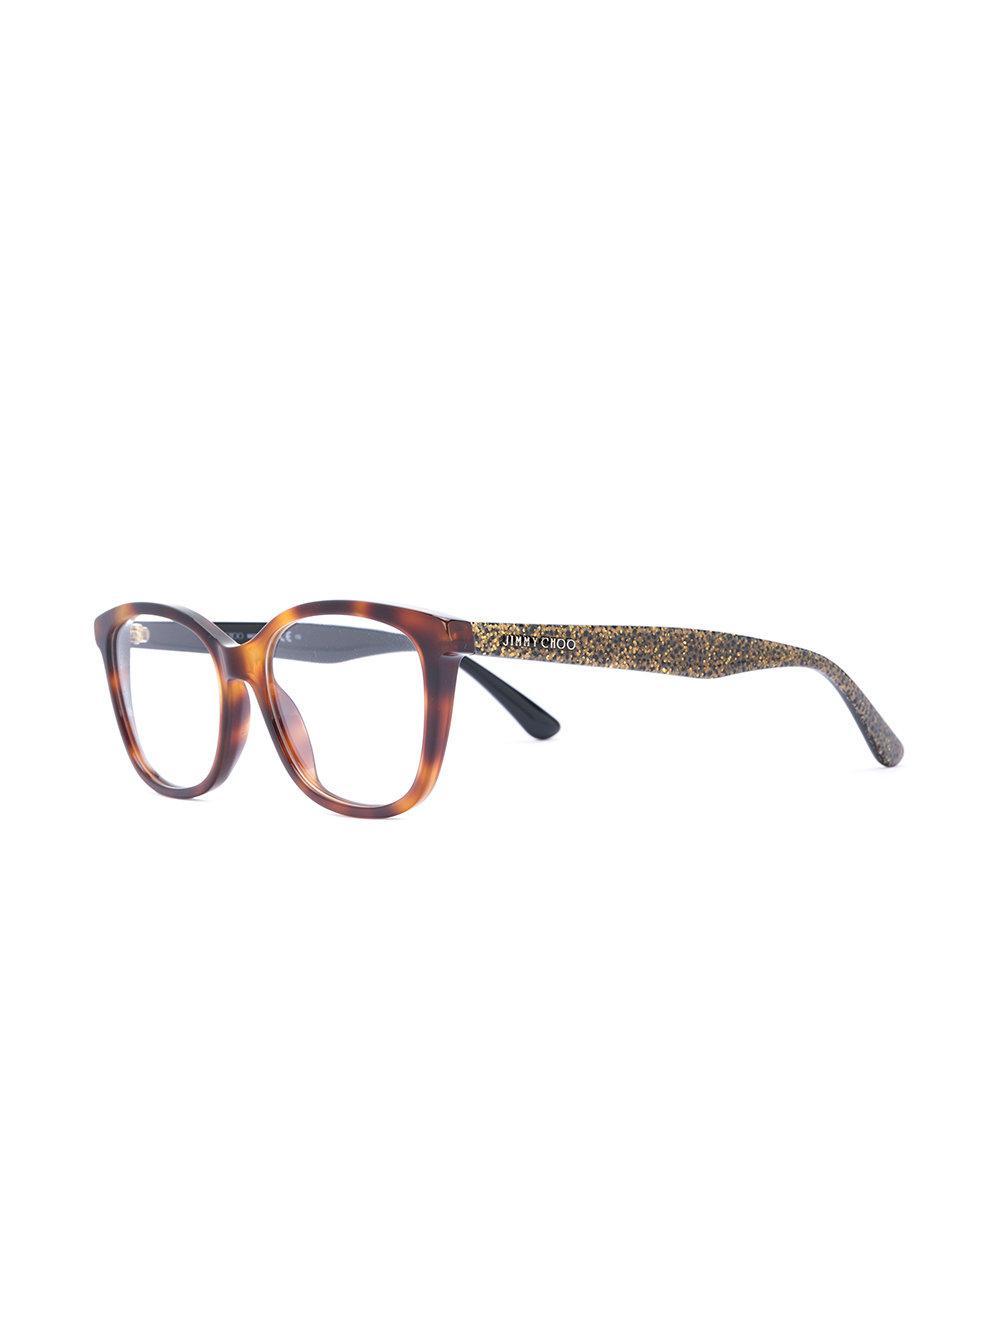 ca2d527c921 Jimmy Choo - Brown Tortoiseshell Glasses - Lyst. View fullscreen